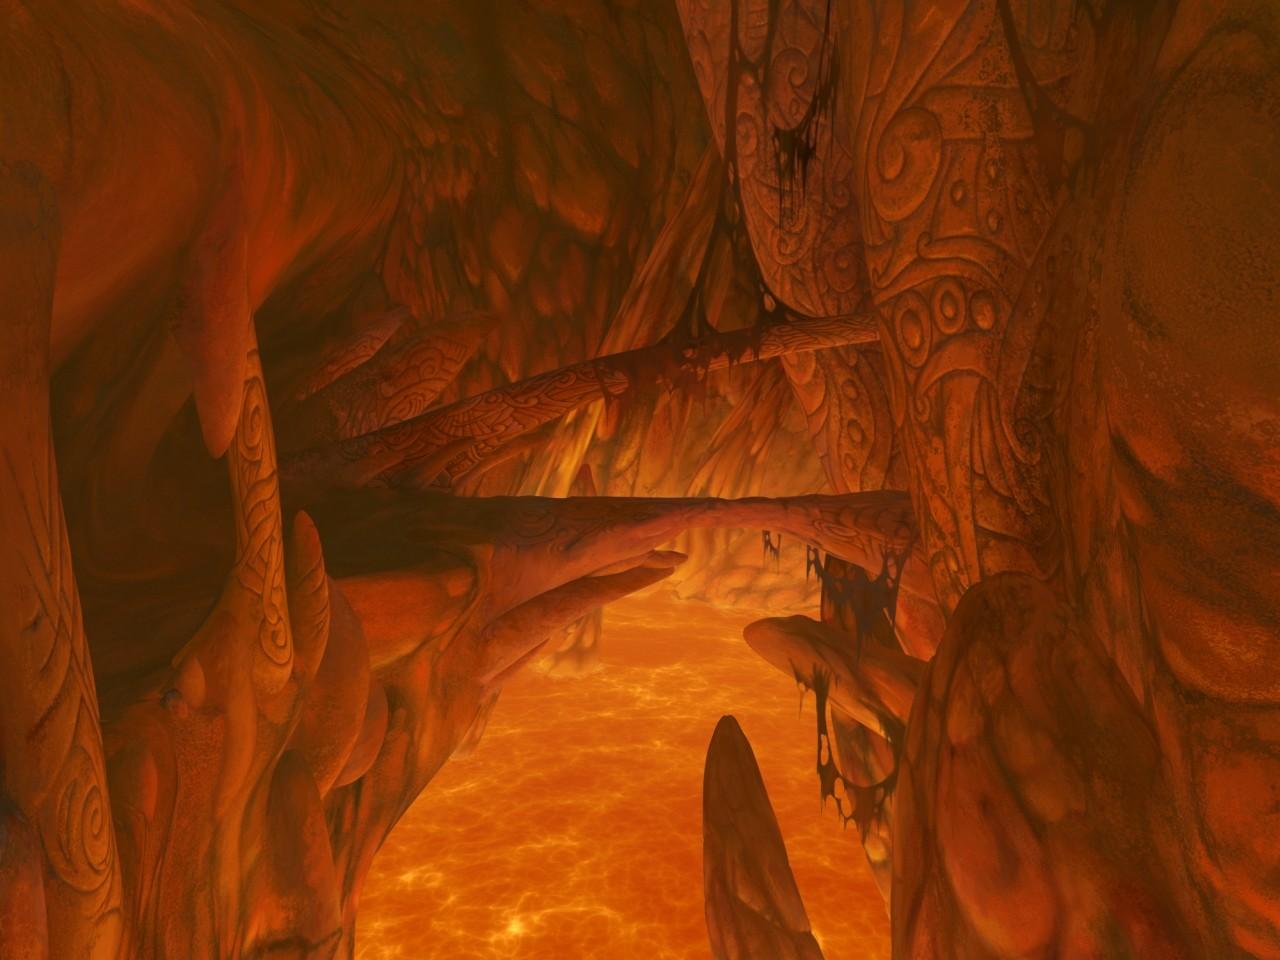 Francois rimasson dragon cave